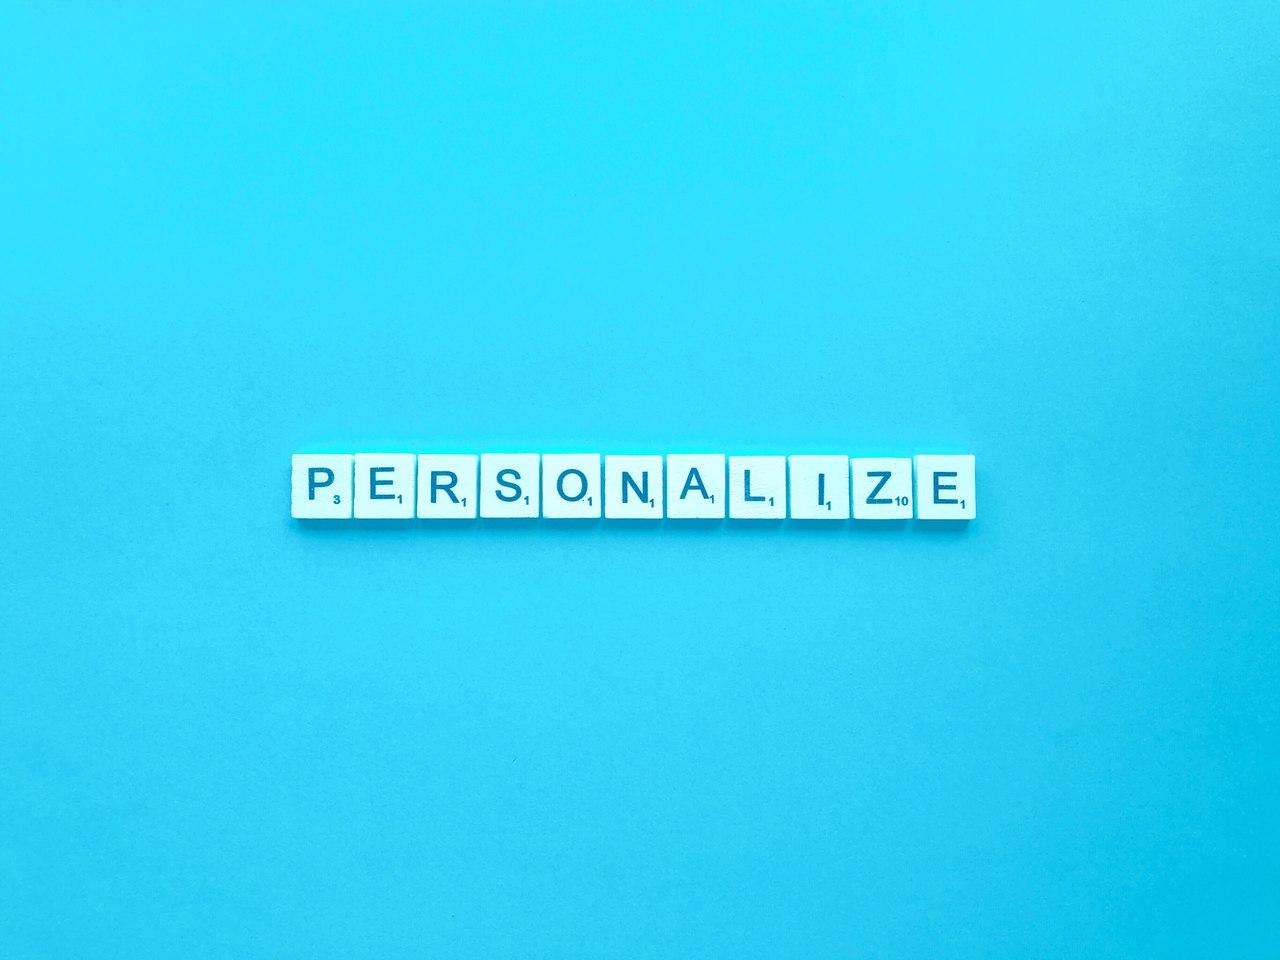 Visuel de la personnalisation